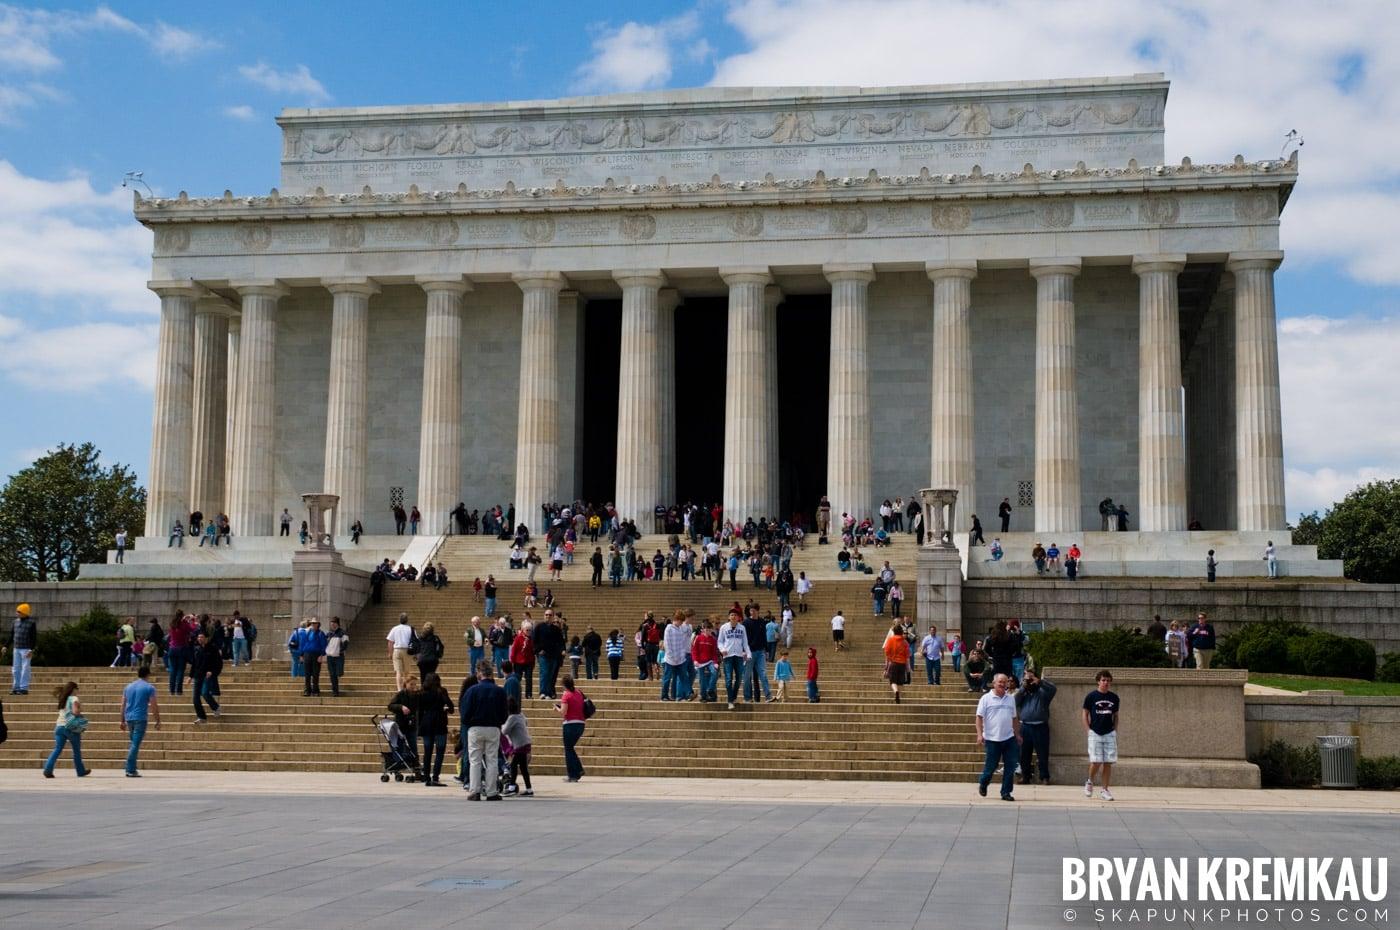 Washington, DC Trip - Day 2 - 4.9.10 (12)